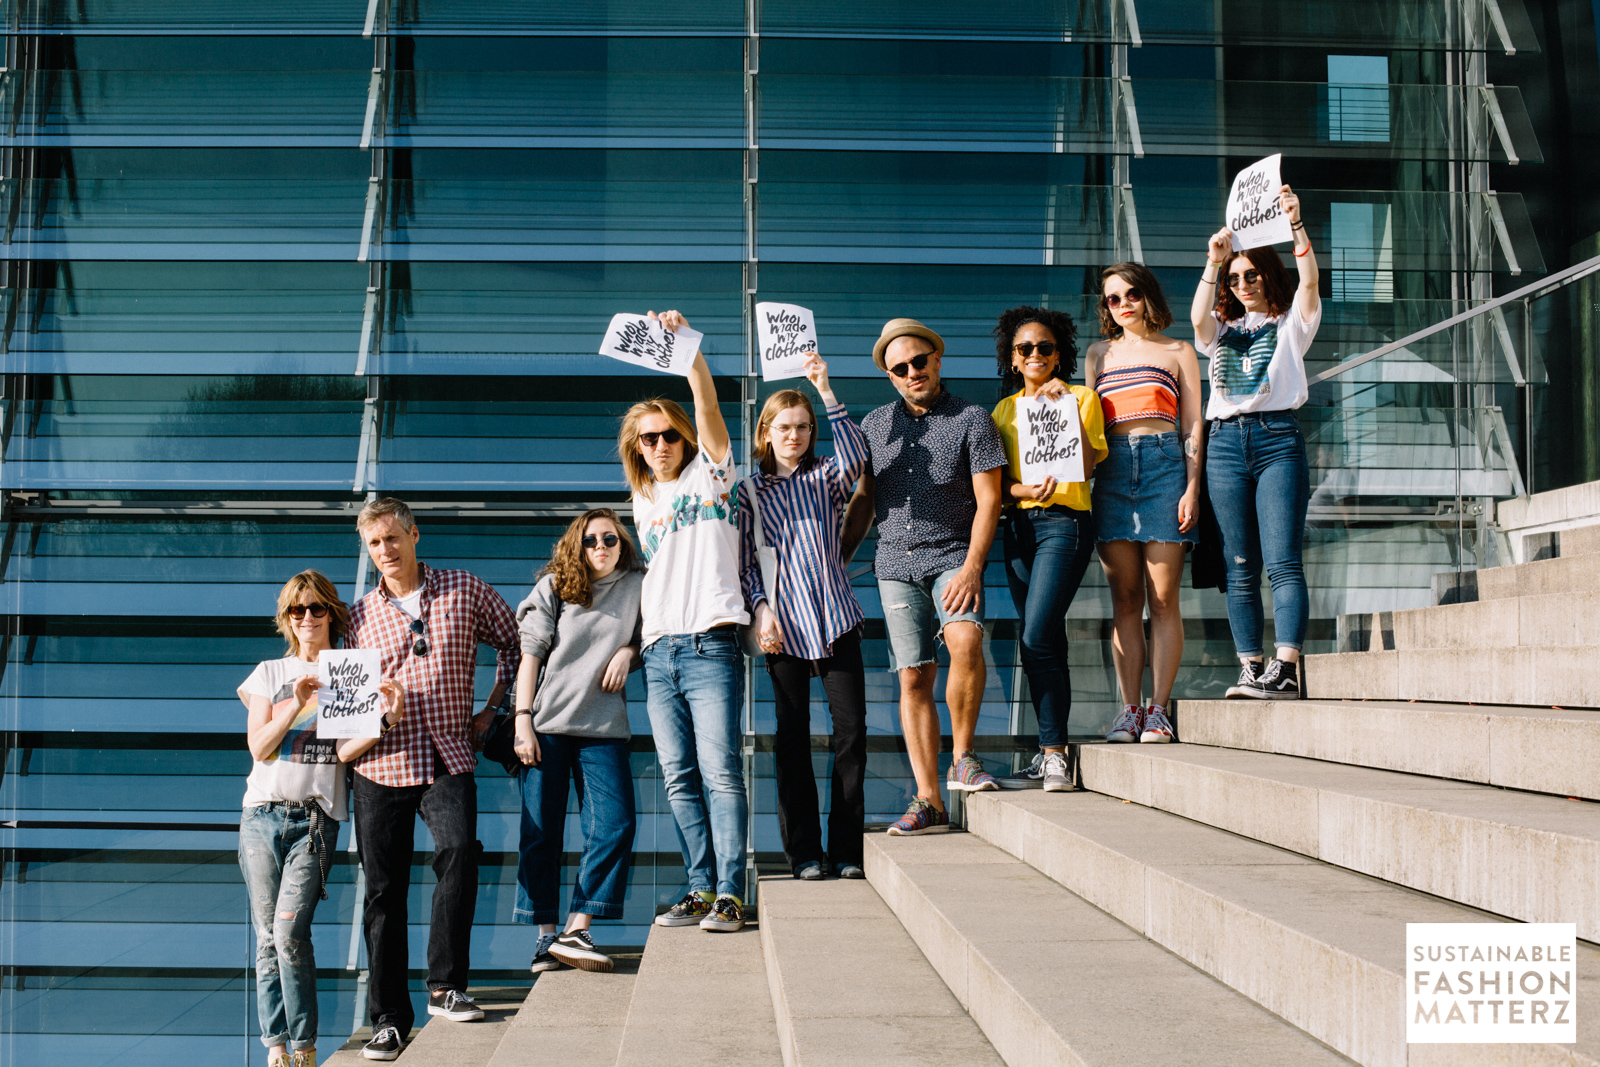 fashion-revolution-by-sustainable-fashion-matterz-94.jpg